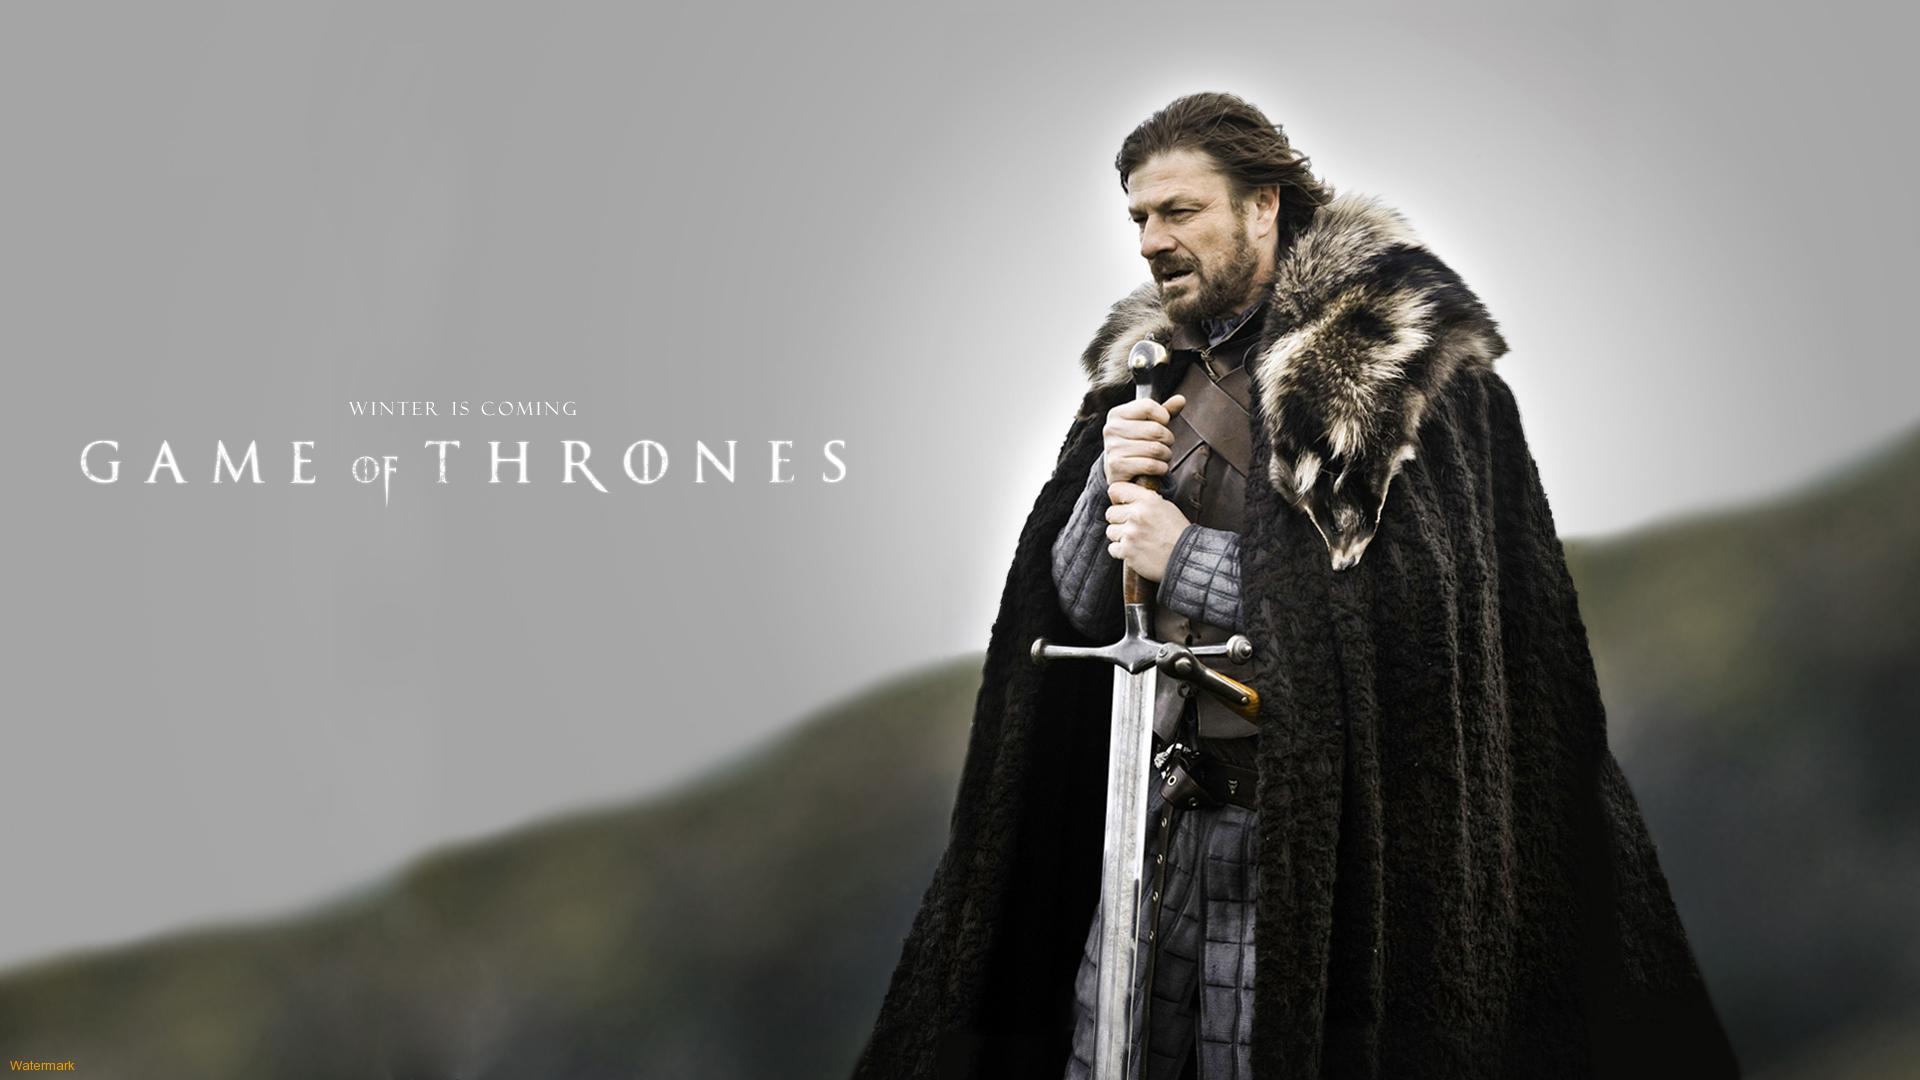 Lord-Eddard-Stark-Game-of-Thrones-1.jpg